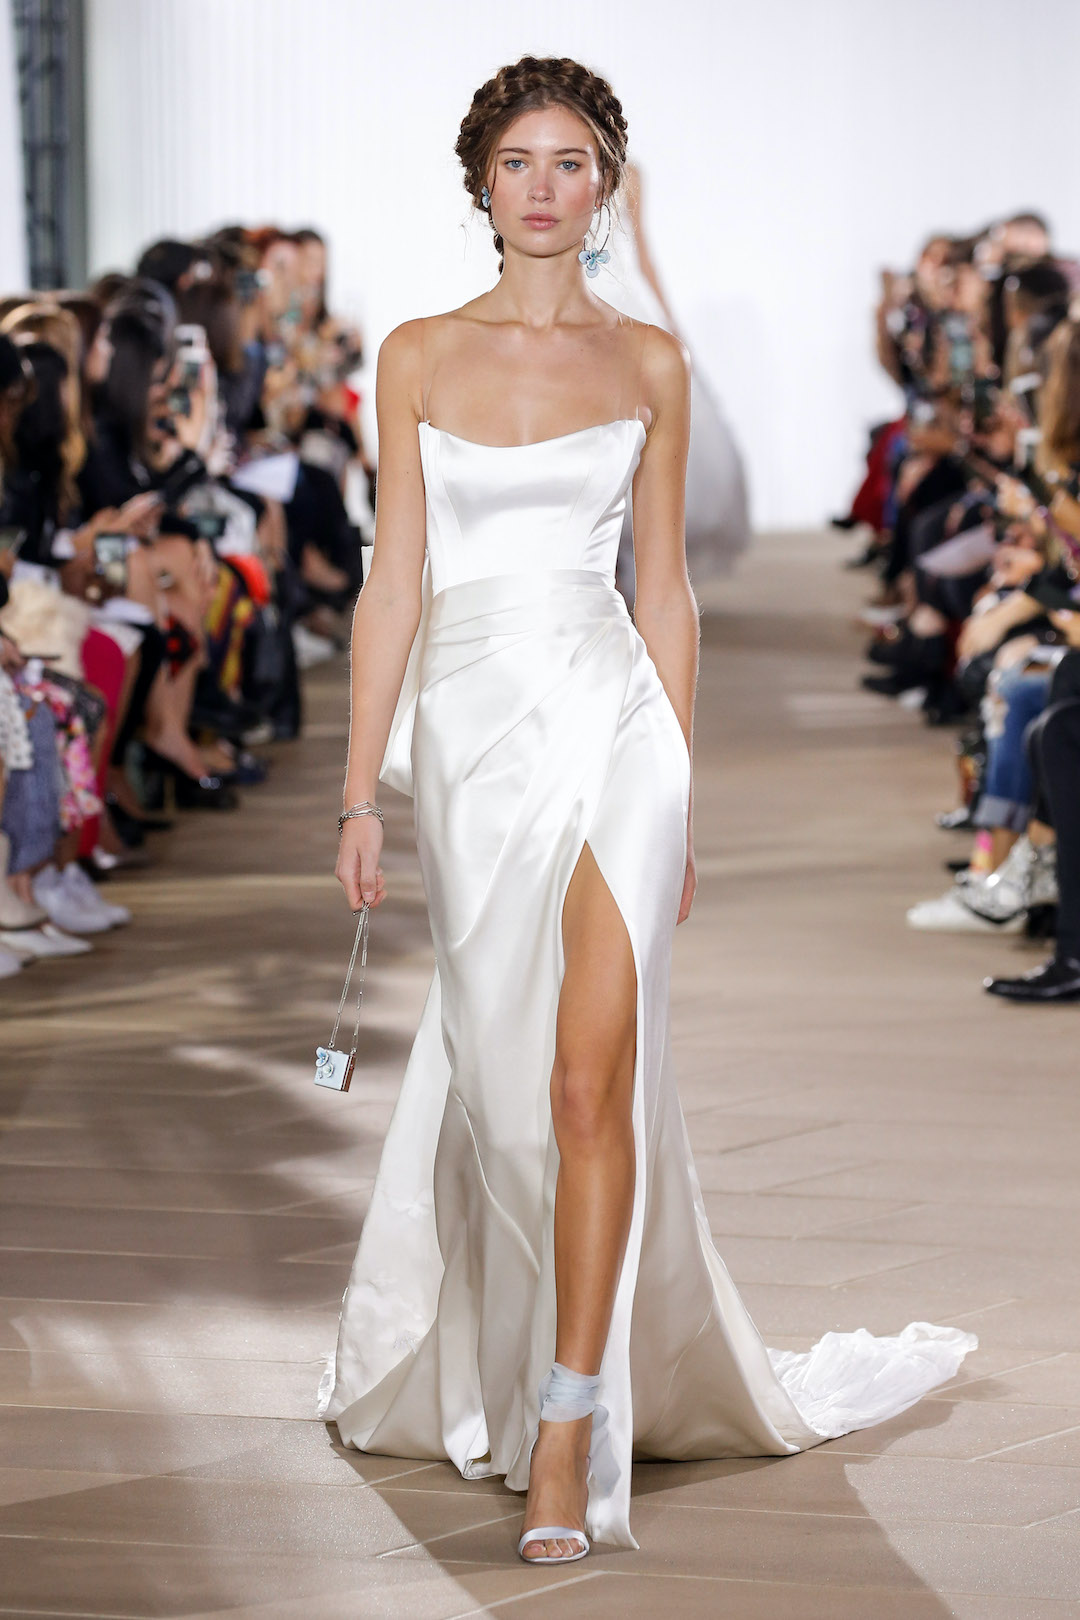 Margot Wedding Dress by Ines Di Santo